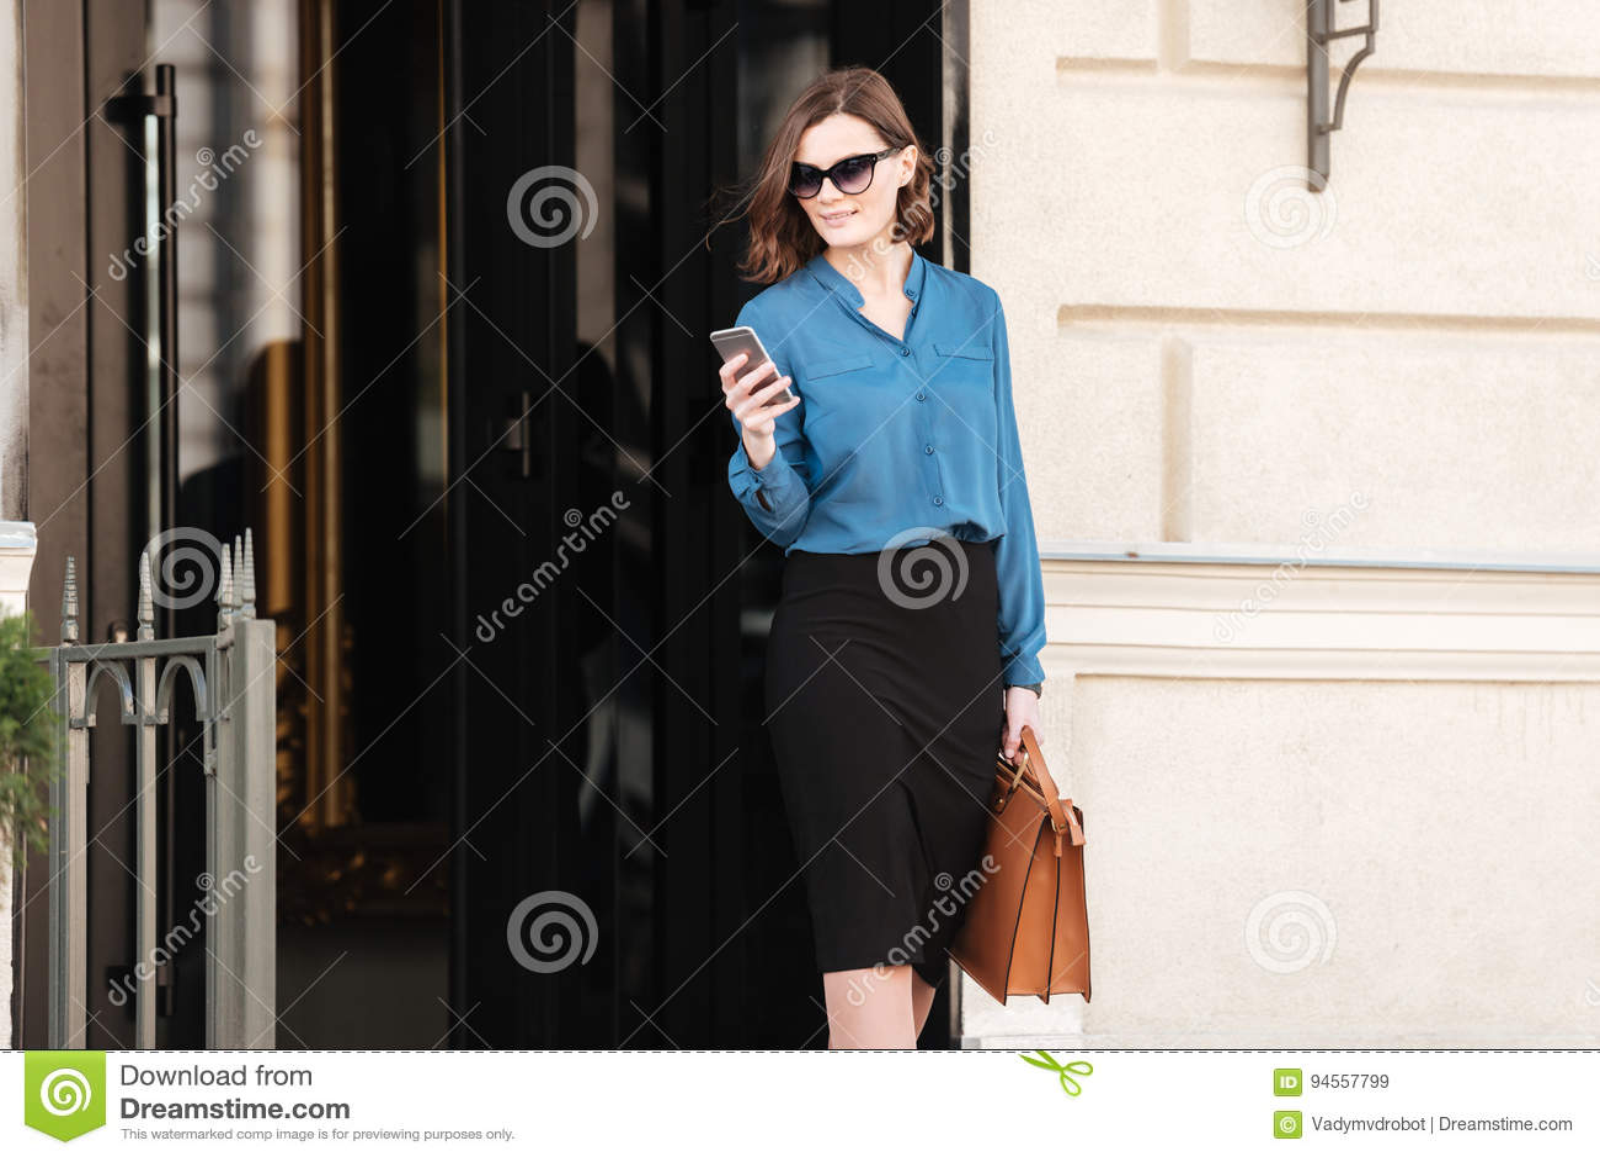 Confident pretty woman in sunglasses using mobile phone